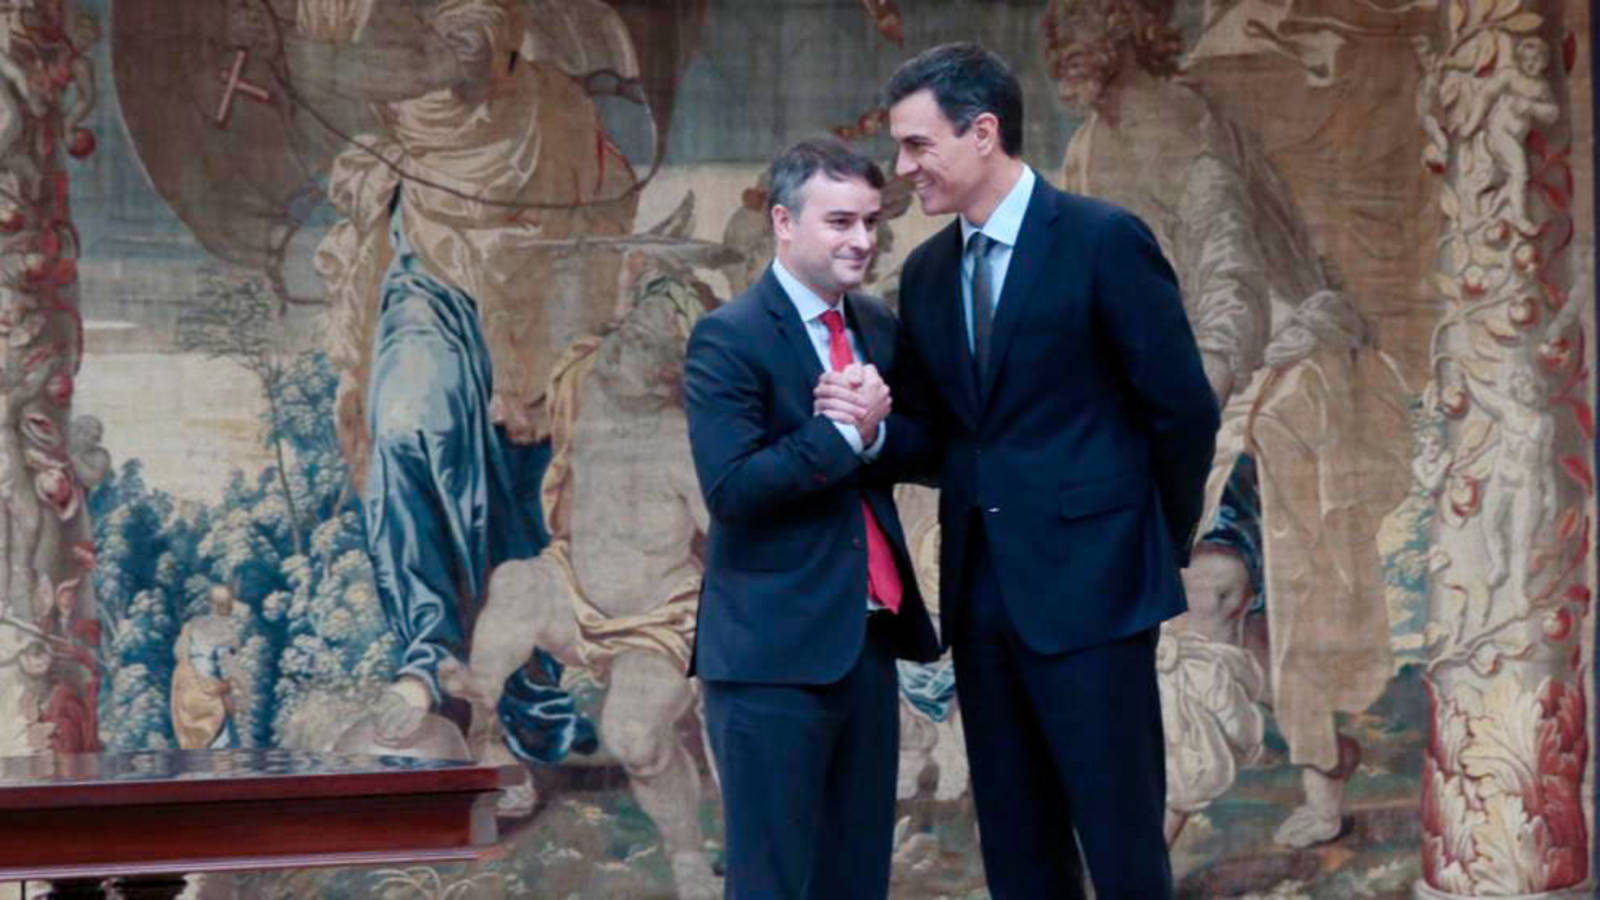 Iván Redondo y Pedro Sánchez / Moncloa